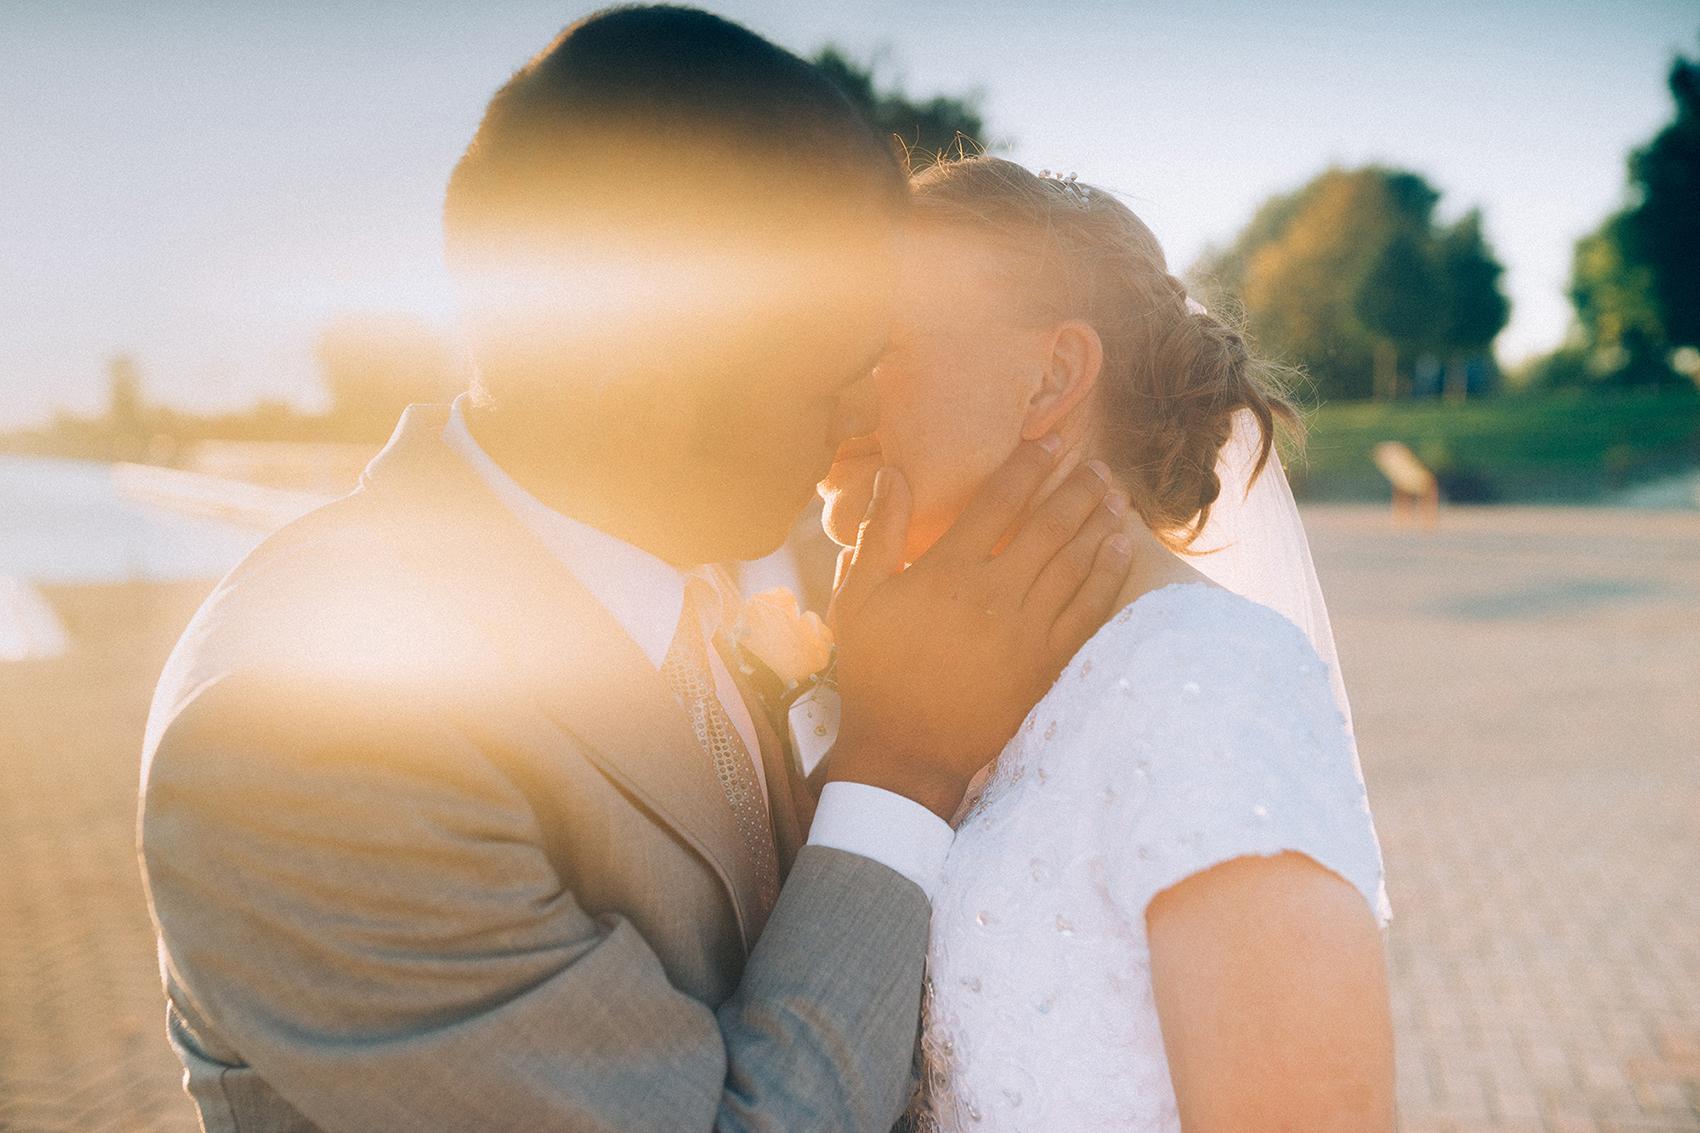 Mike_Mendez_Photography_Wedding_Engagements_7